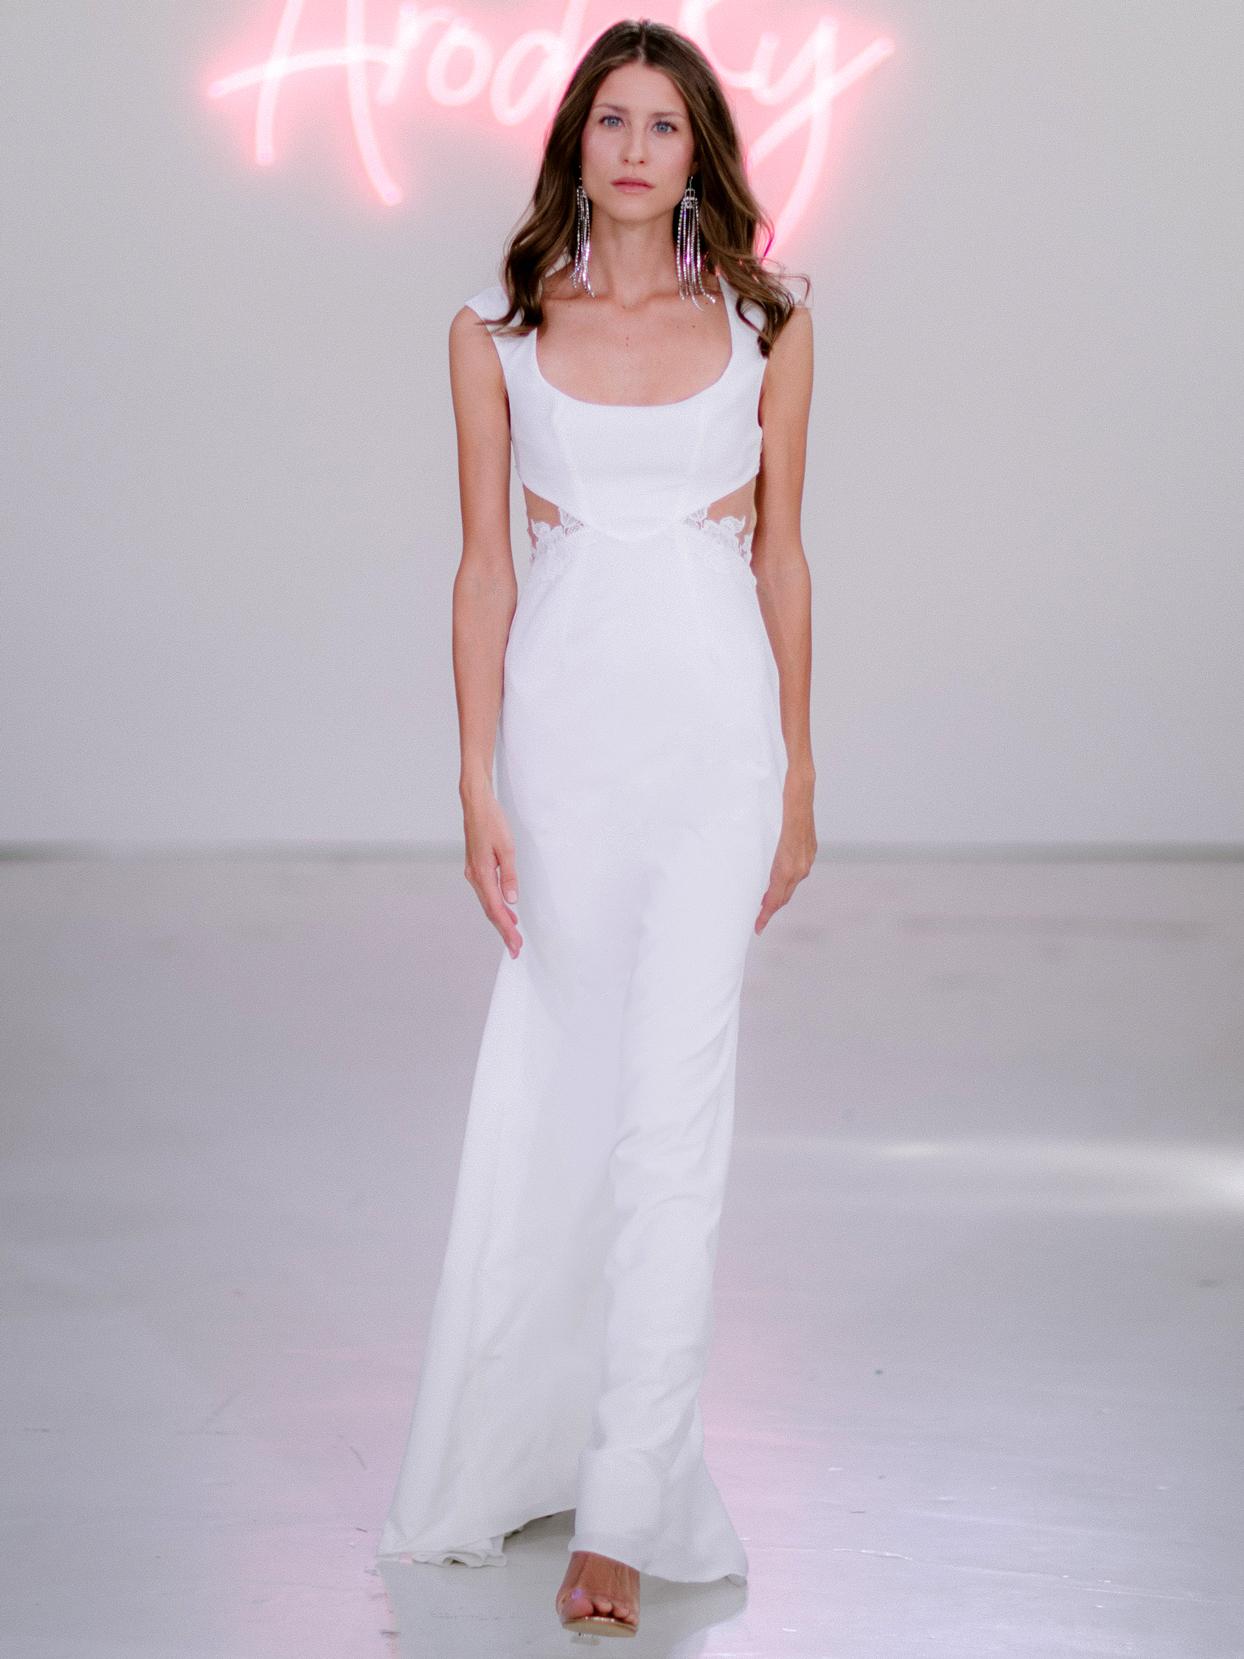 Rime Arodaky X The Mews Bridal side cut-outs sleeveless wedding dress fall 2020